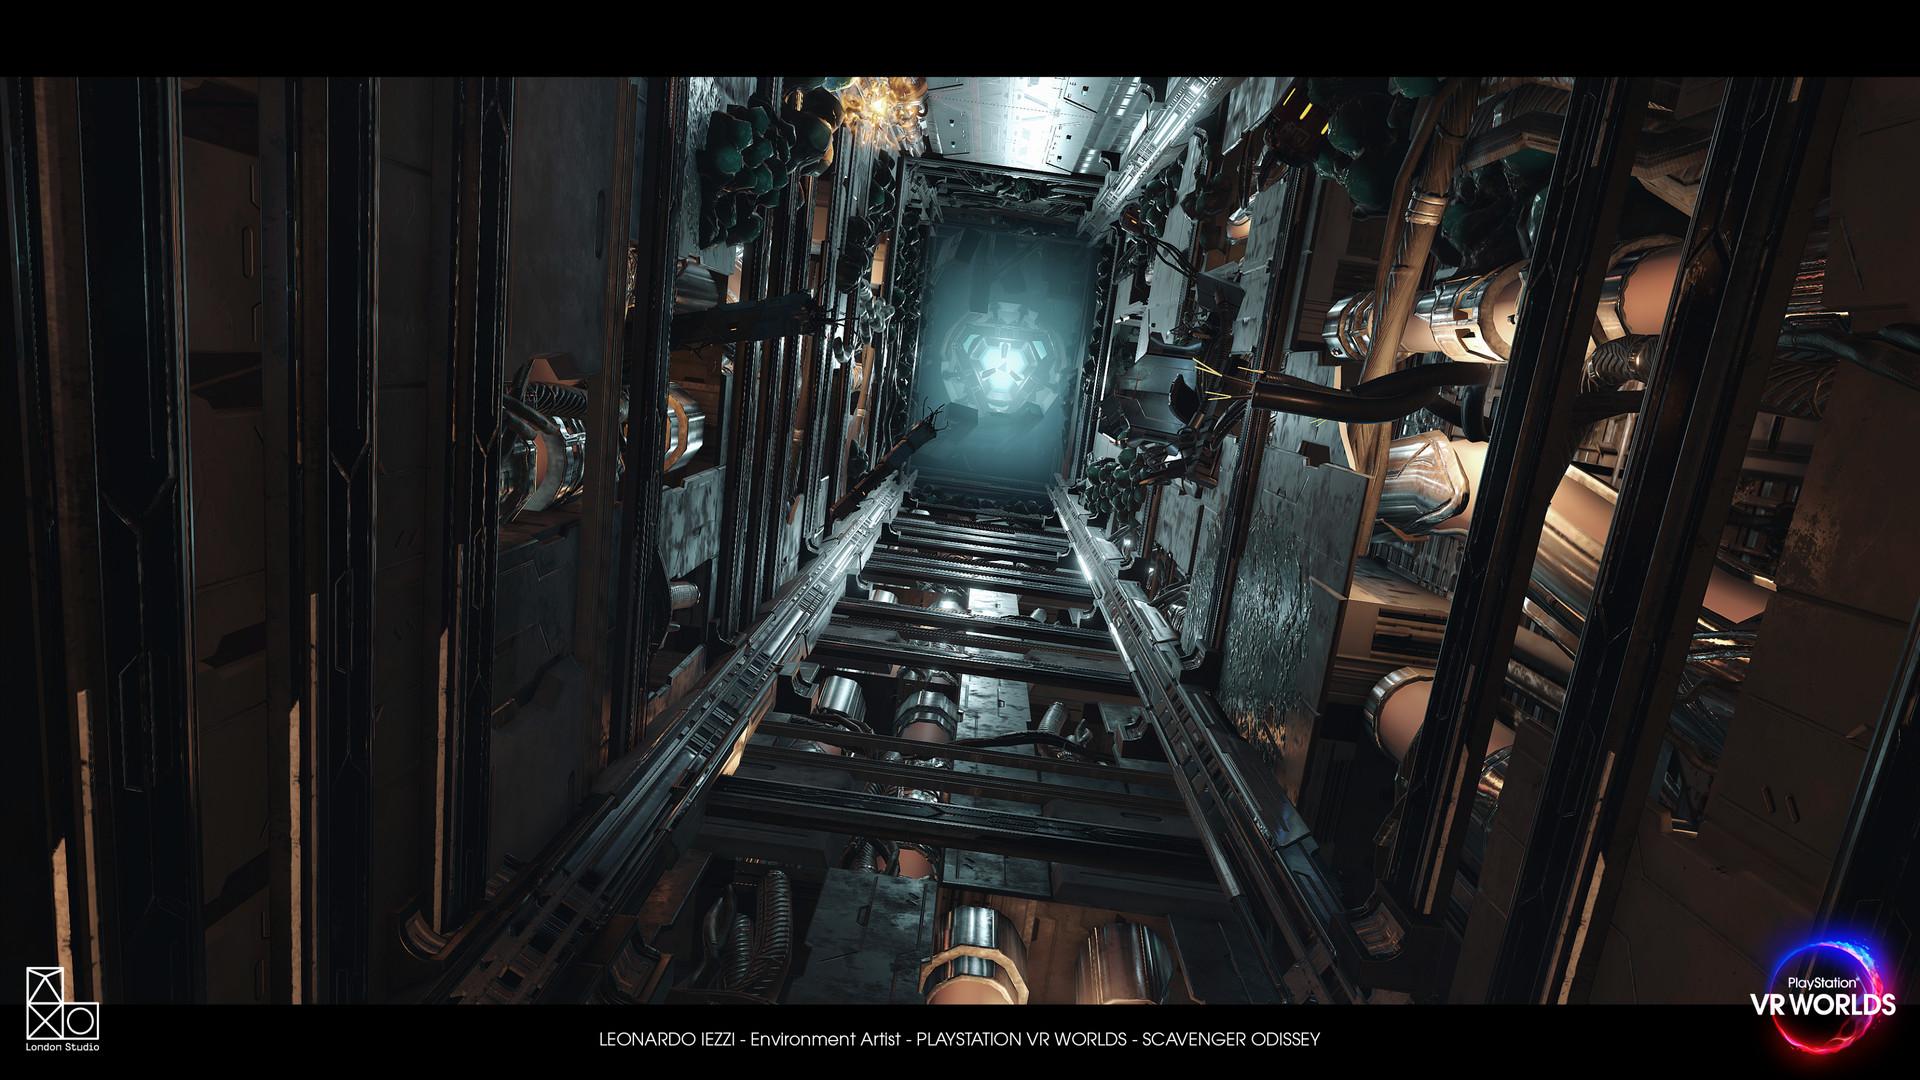 Leonardo iezzi leonardo iezzi environment artist vr worlds scavenger odissey 02